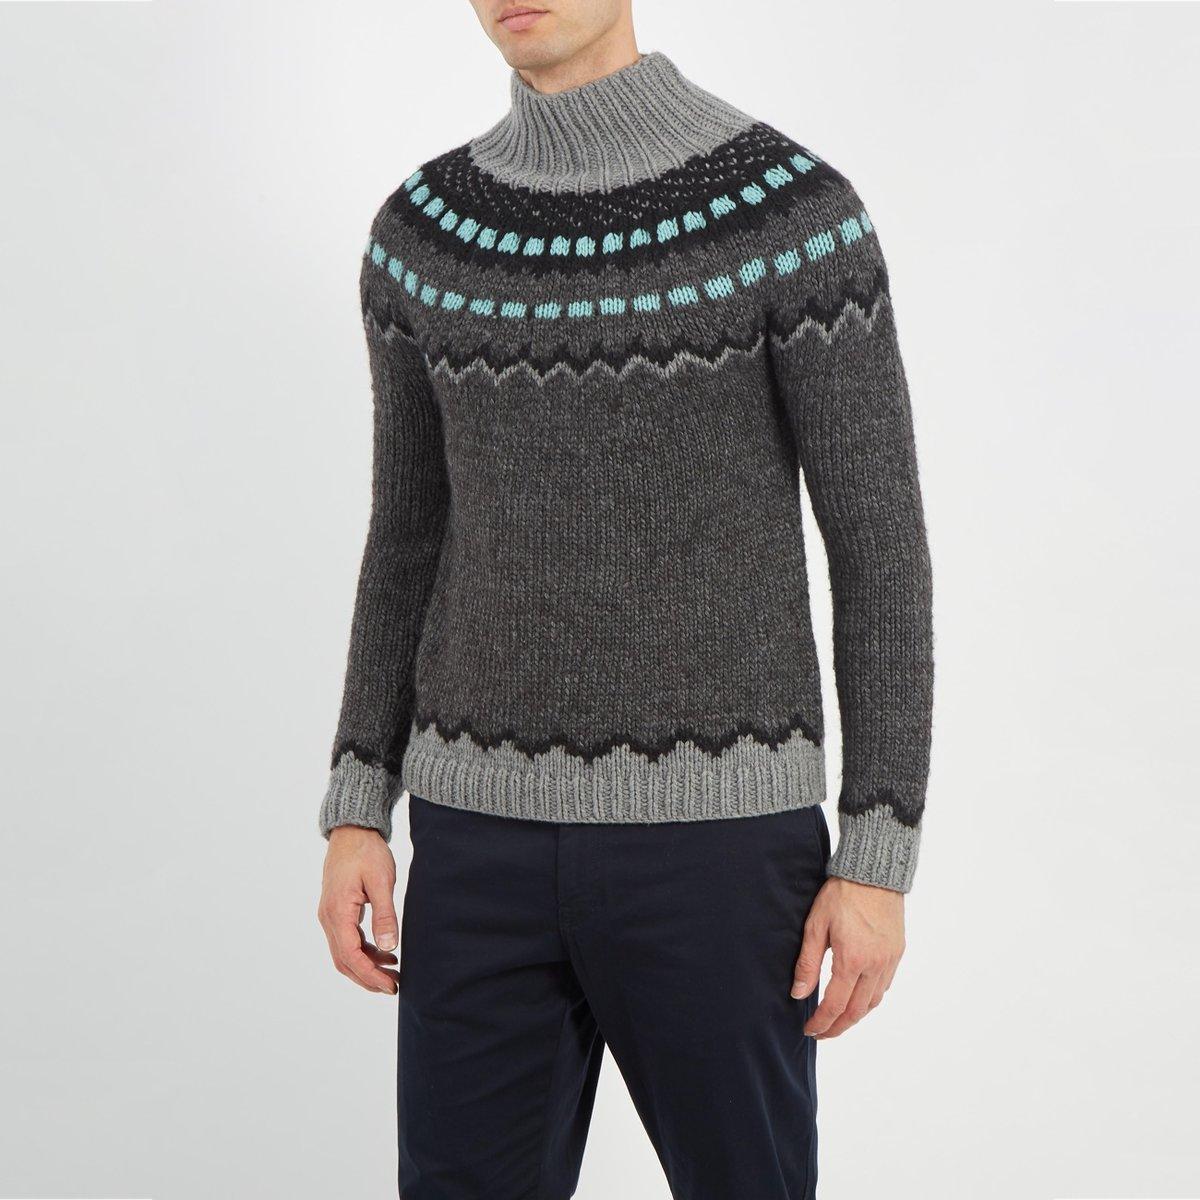 valentino-GREY-Funnel-neck-Geometric-intarsia-Sweater (3).jpg